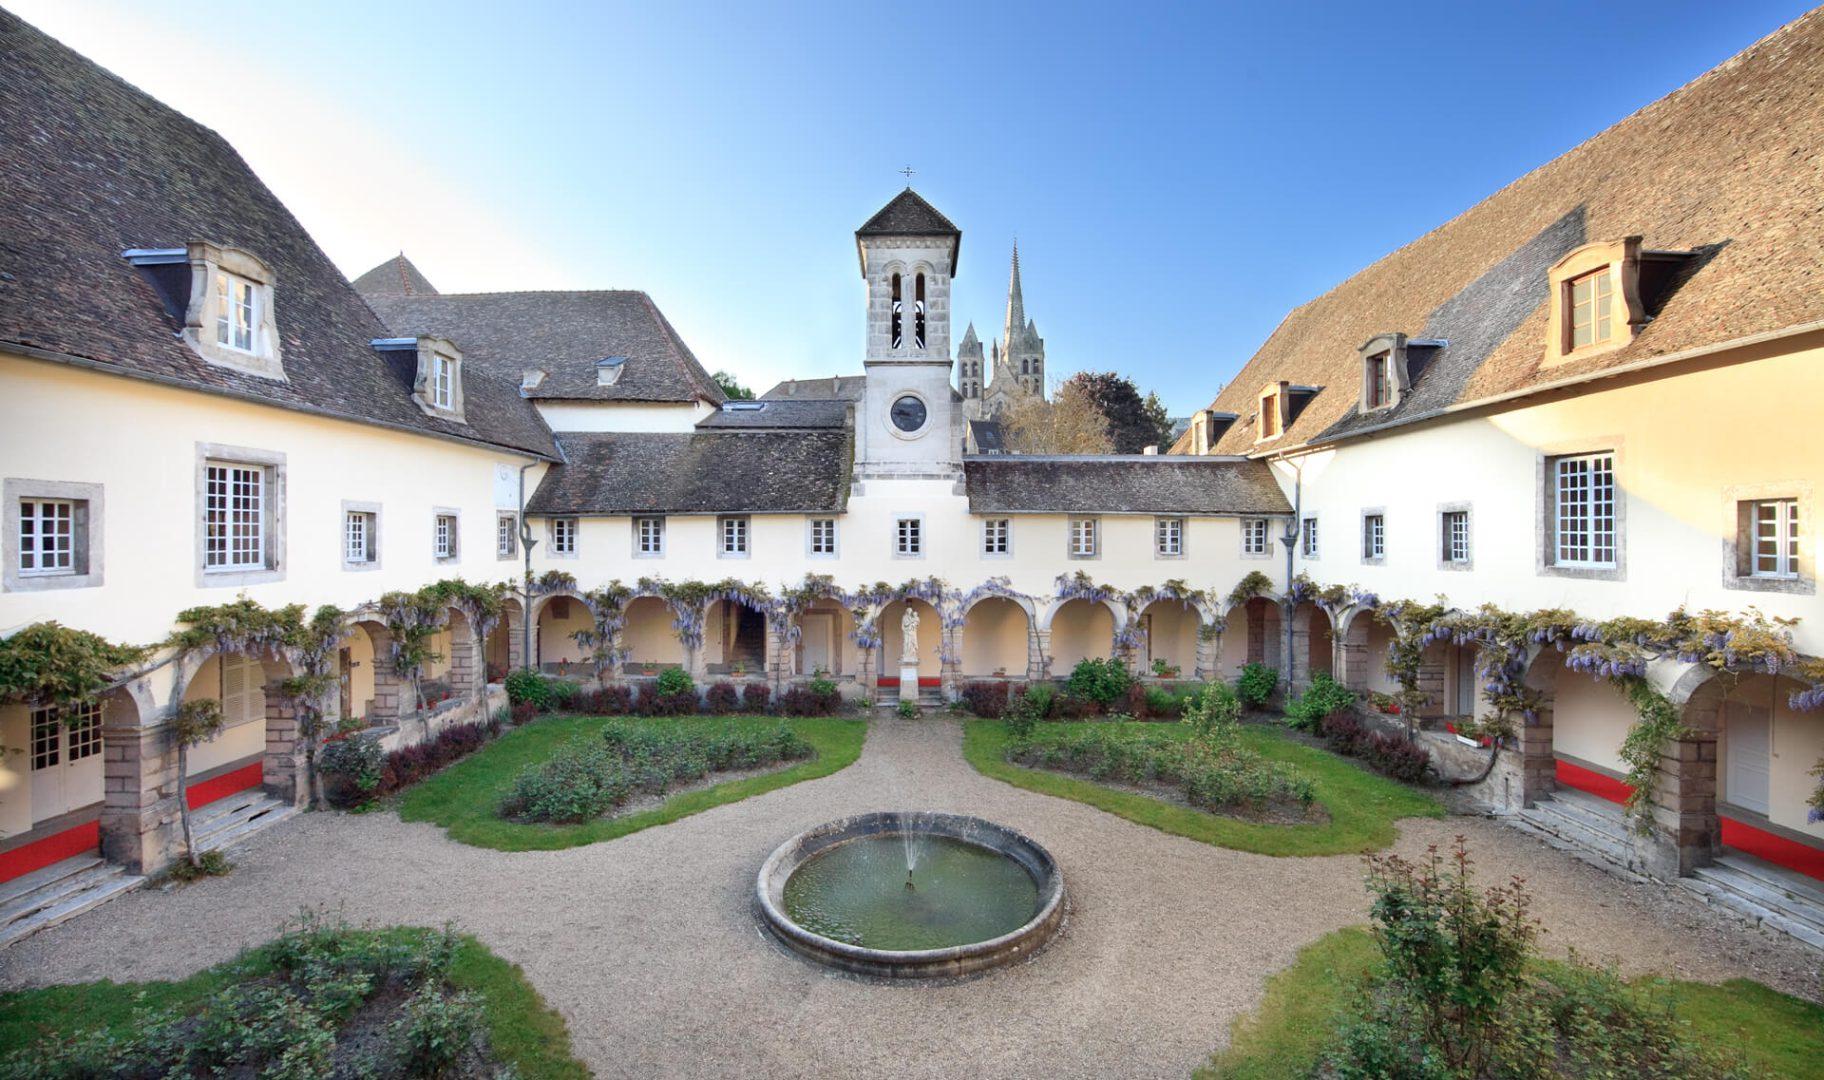 Jardin de la residence senior Autun, Villa Médicis